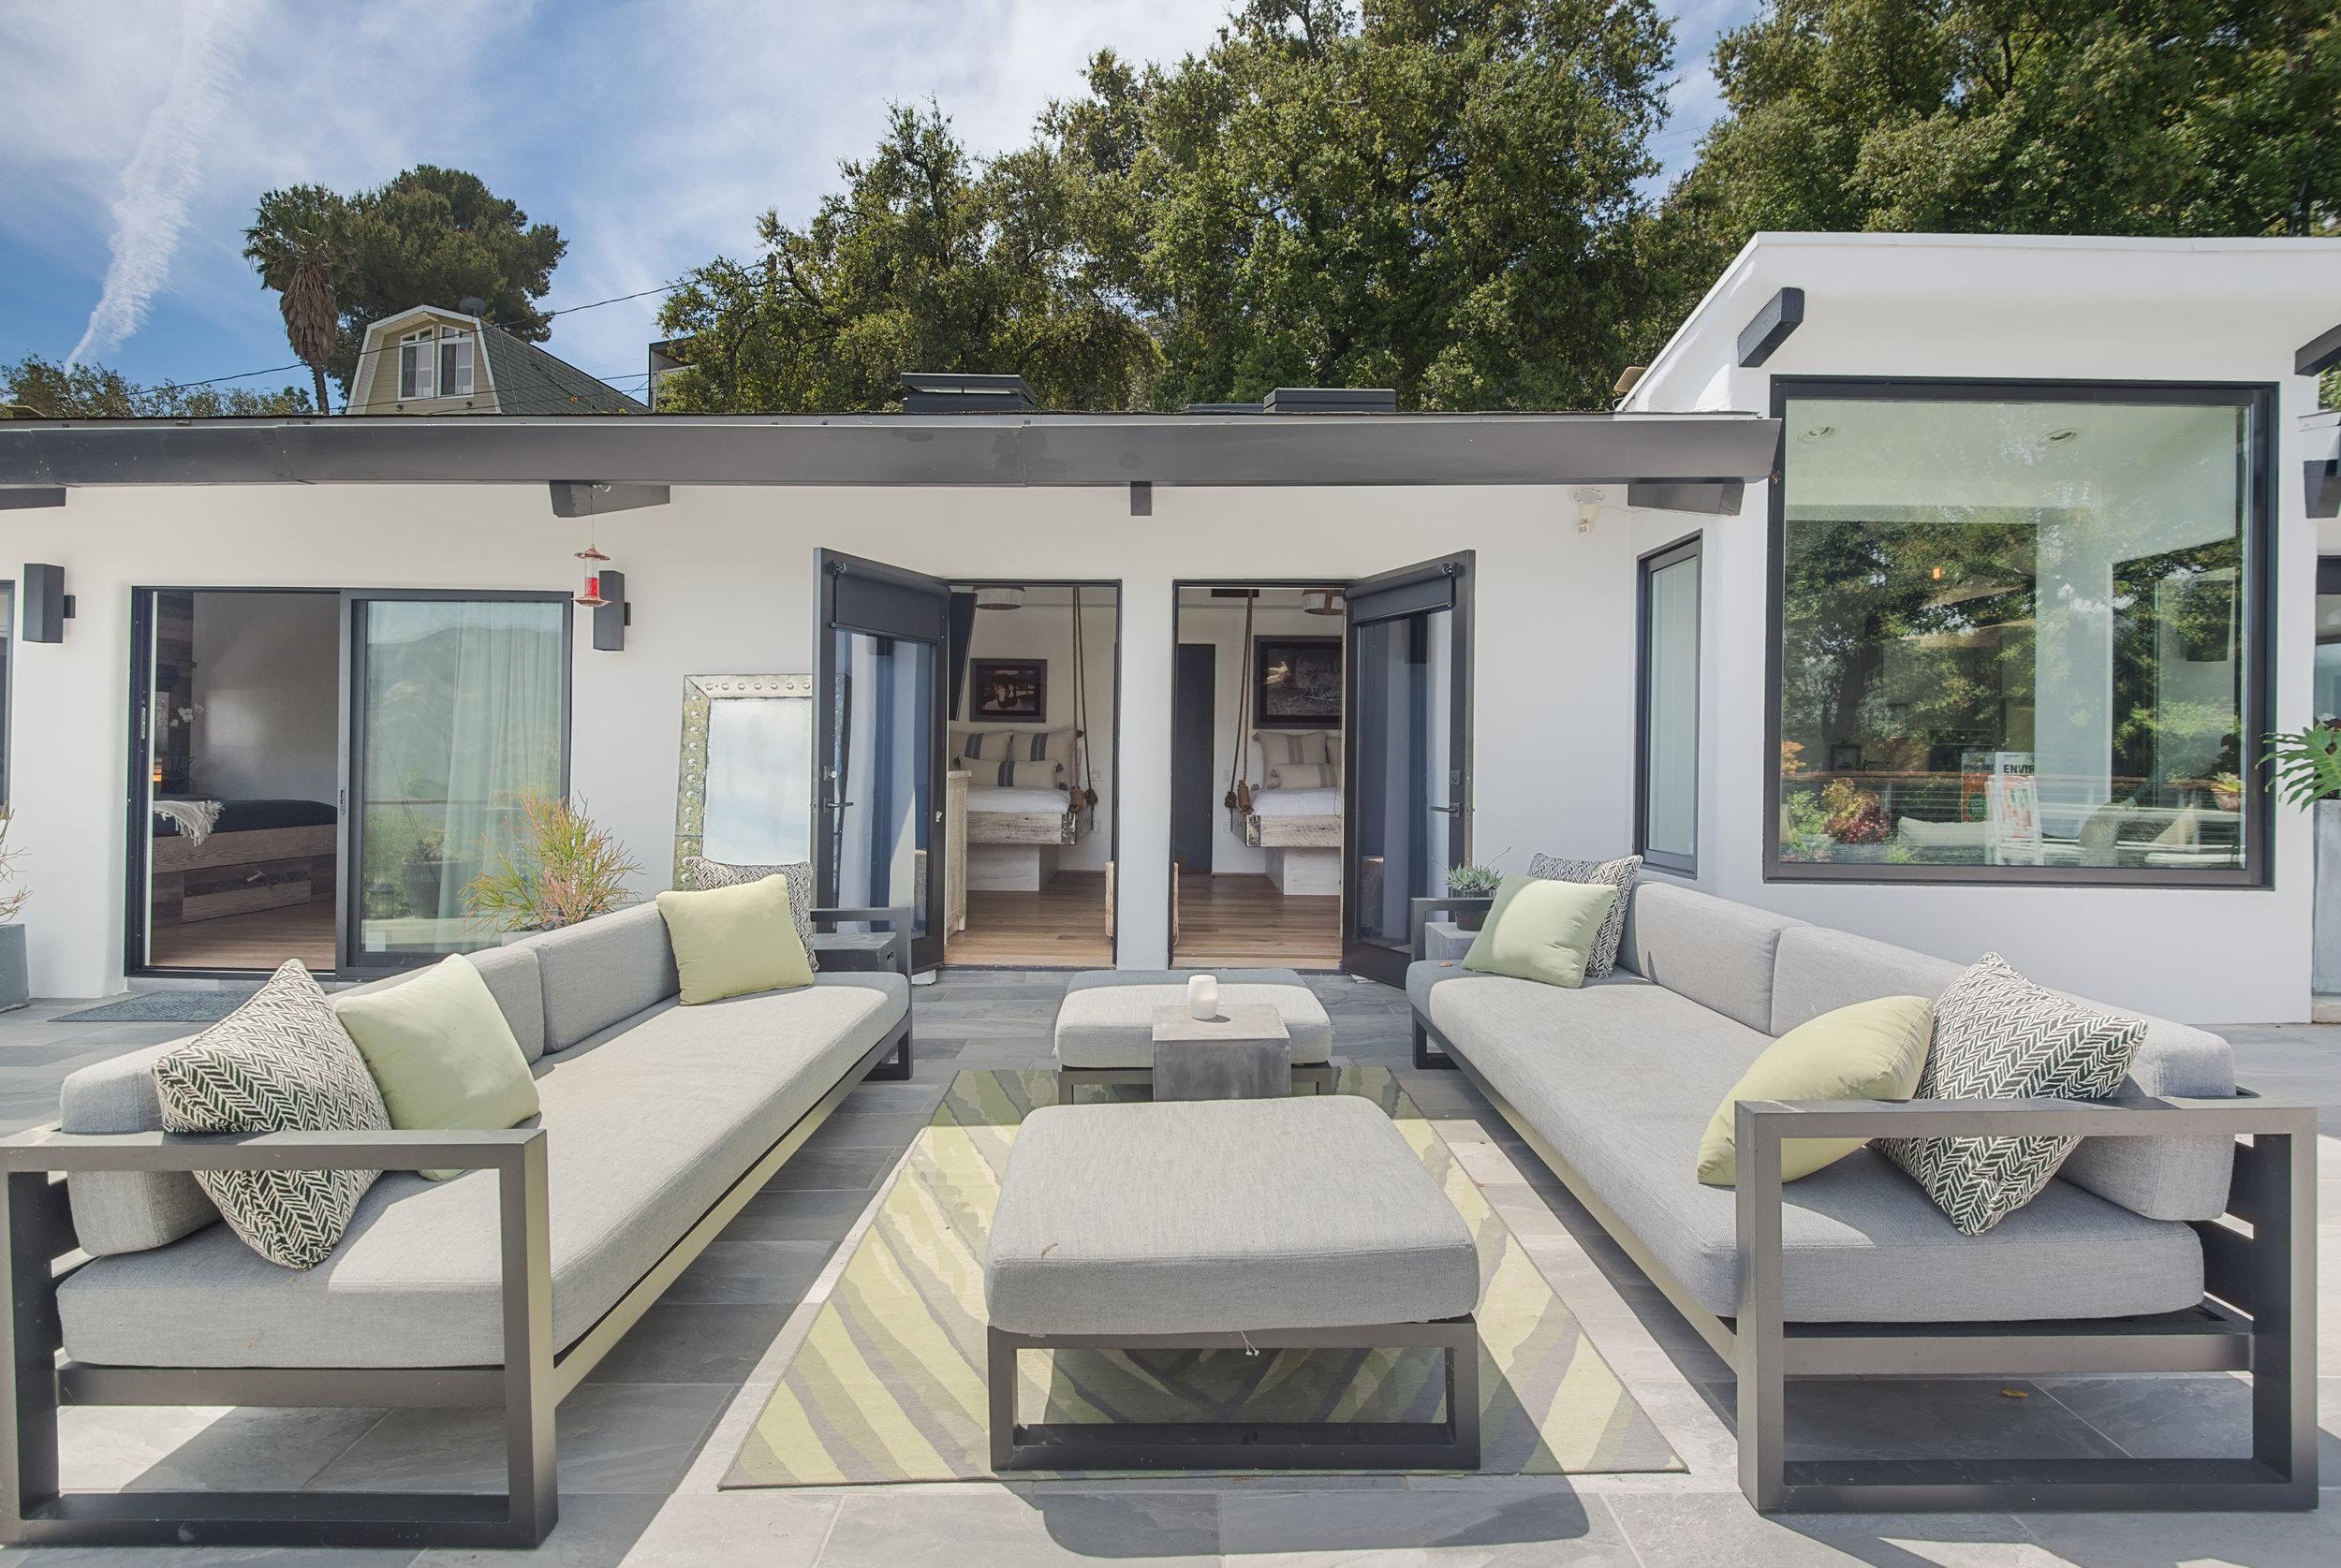 008 Front 26272 Cool Glen Way Malibu For Sale Luxury Real Estate.jpg